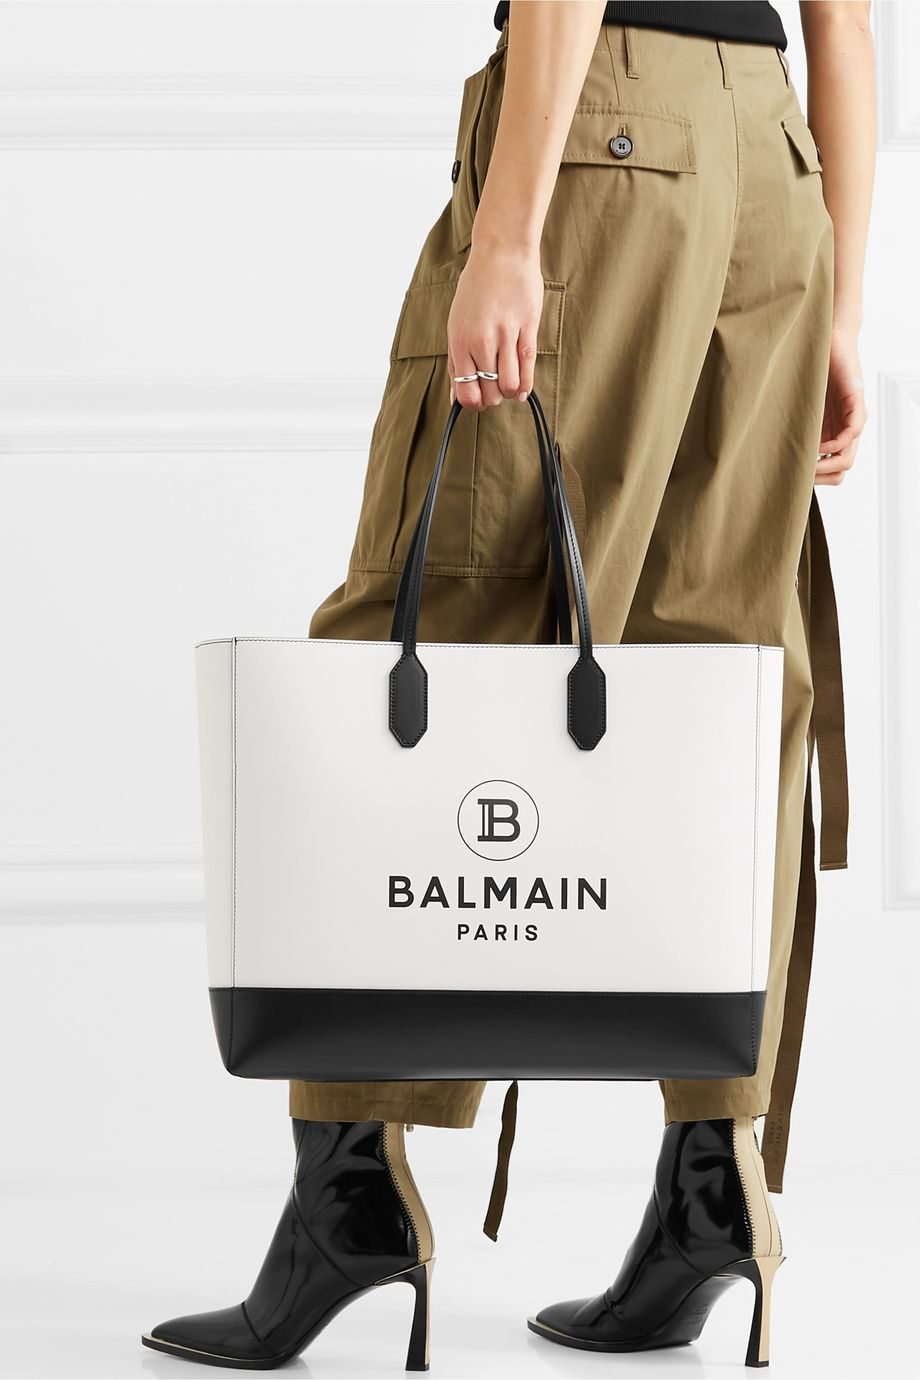 Balmain Printed leather tote